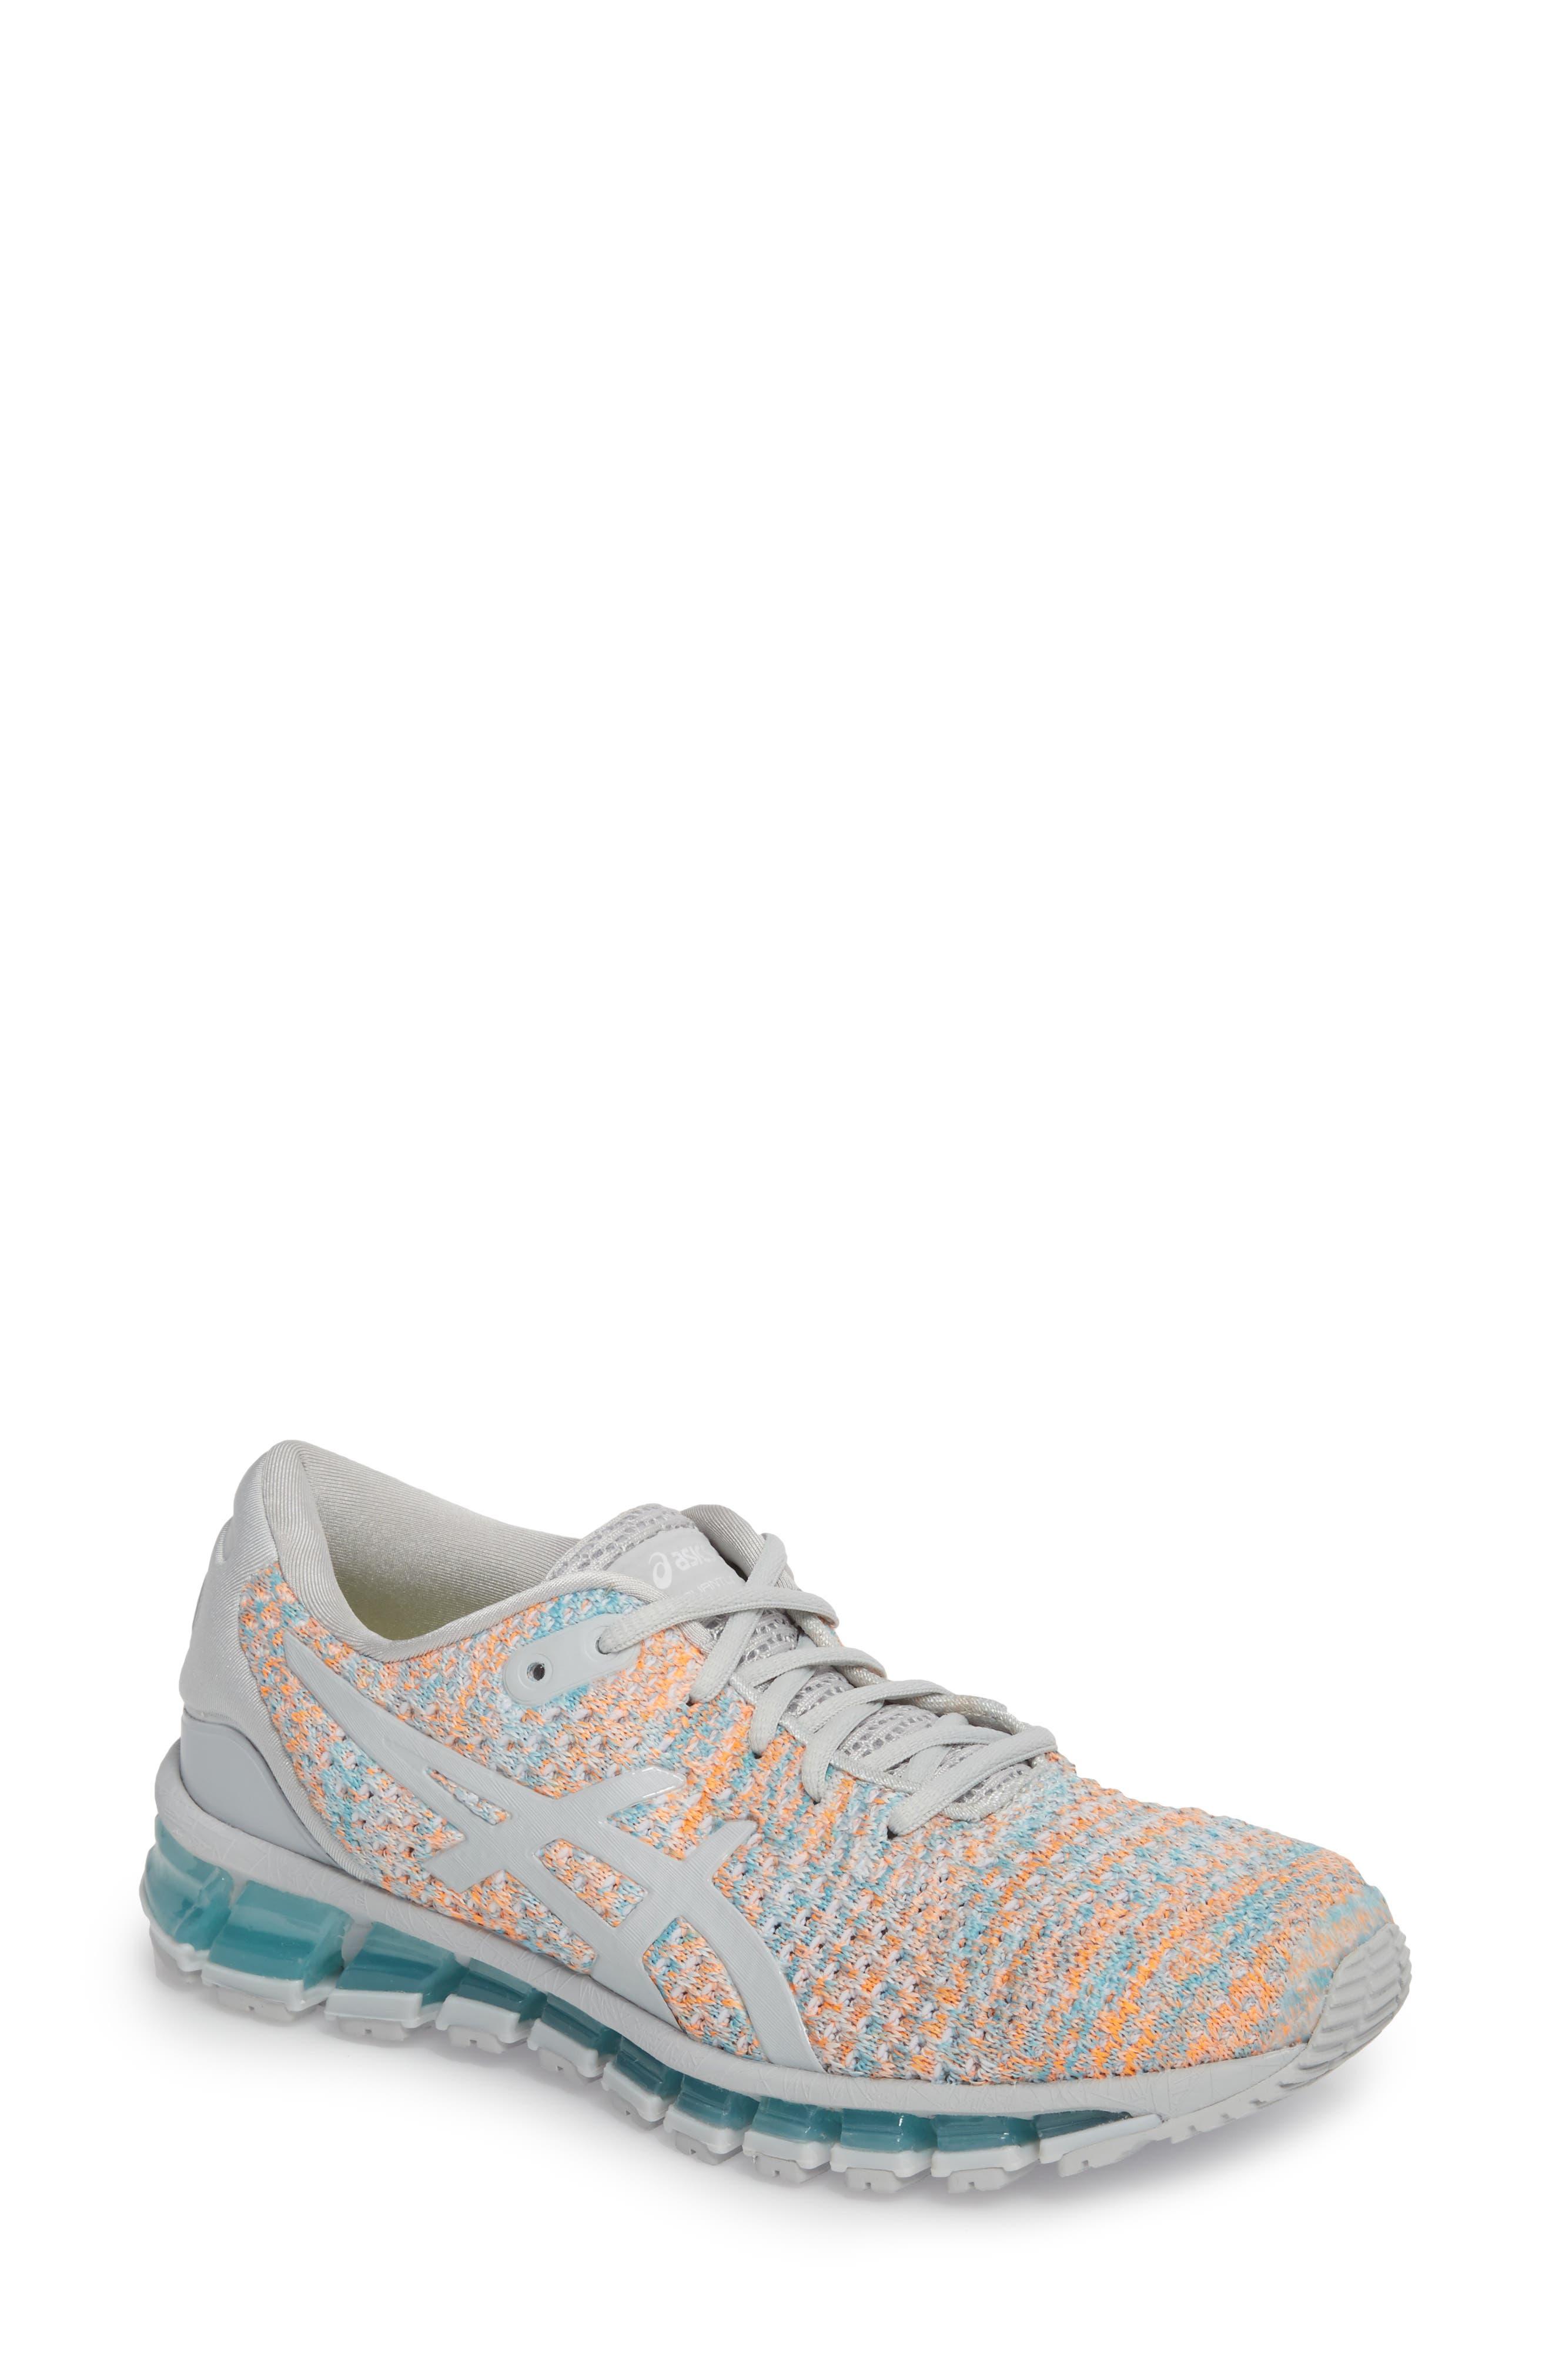 GEL-Quantum 360 Running Shoe,                         Main,                         color, GLACIER GREY/ ORANGE POP/ BLUE